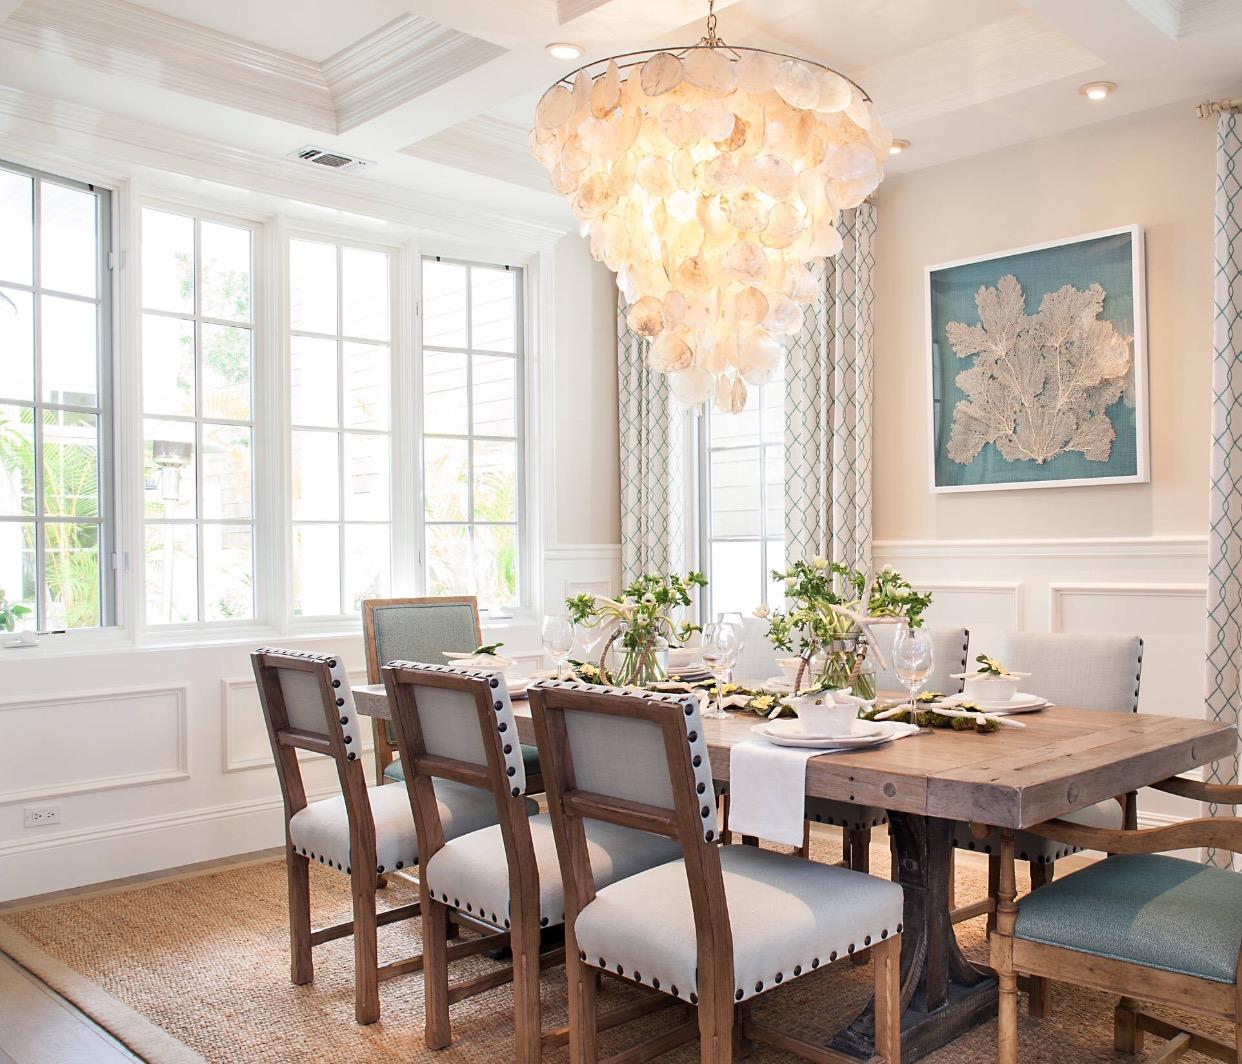 Coastal Dining Room with Sea Fan wall art